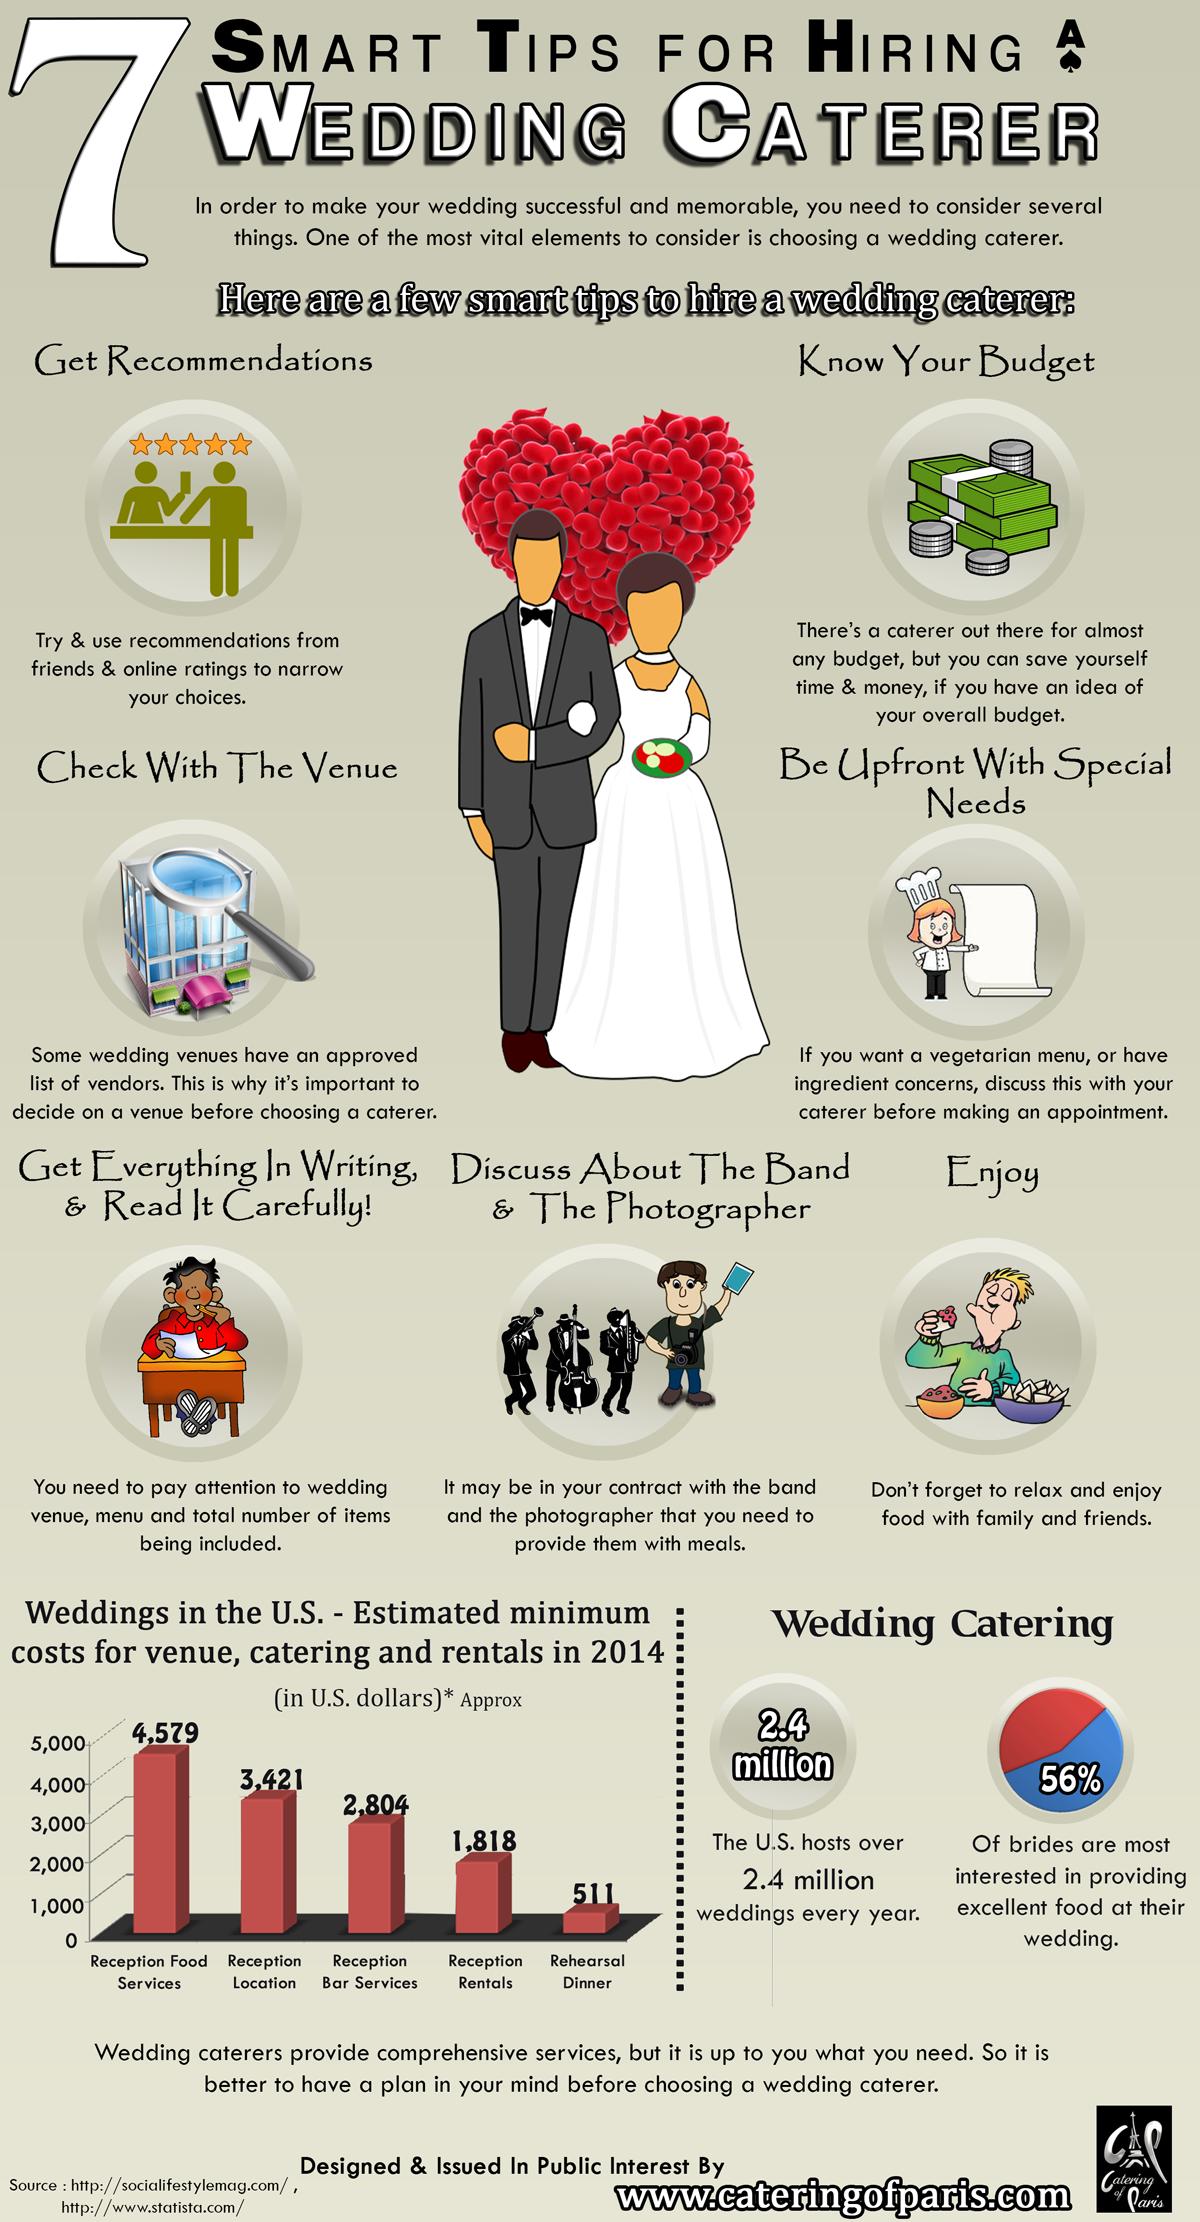 Smart tips for hiring a wedding caterer